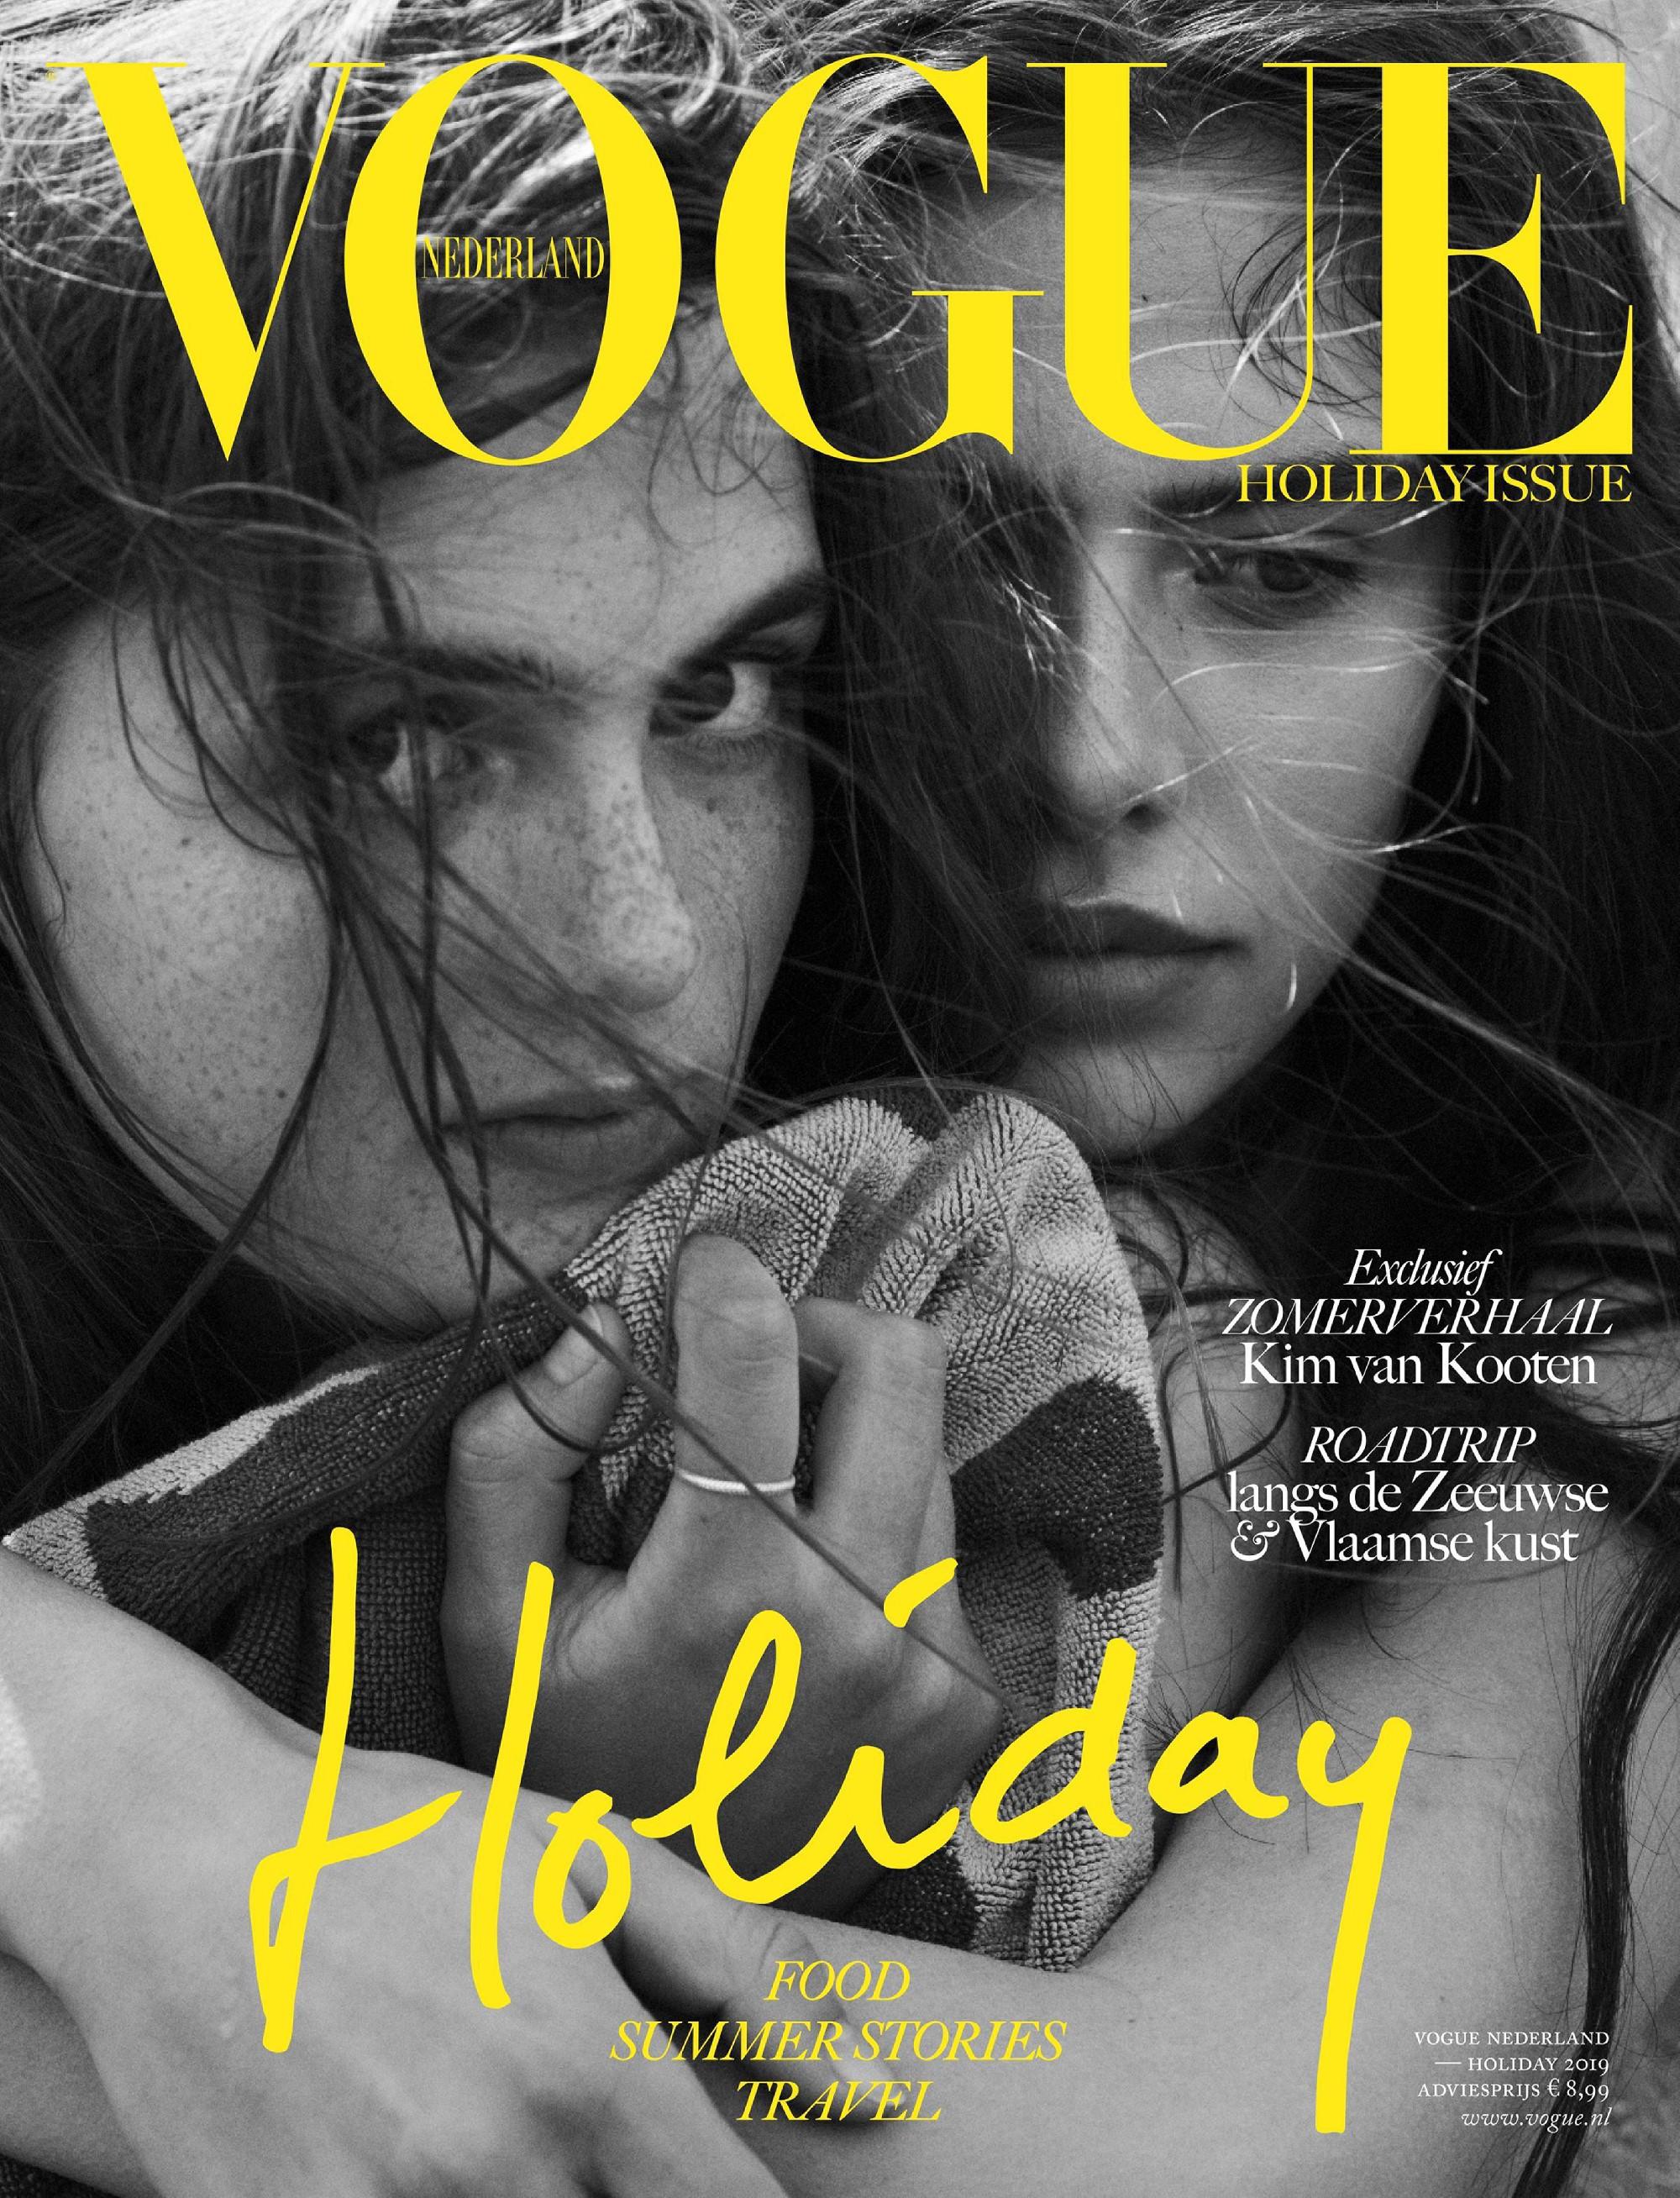 Paul Bellart Vogue Netherlands Holiday 2019 (12).jpg